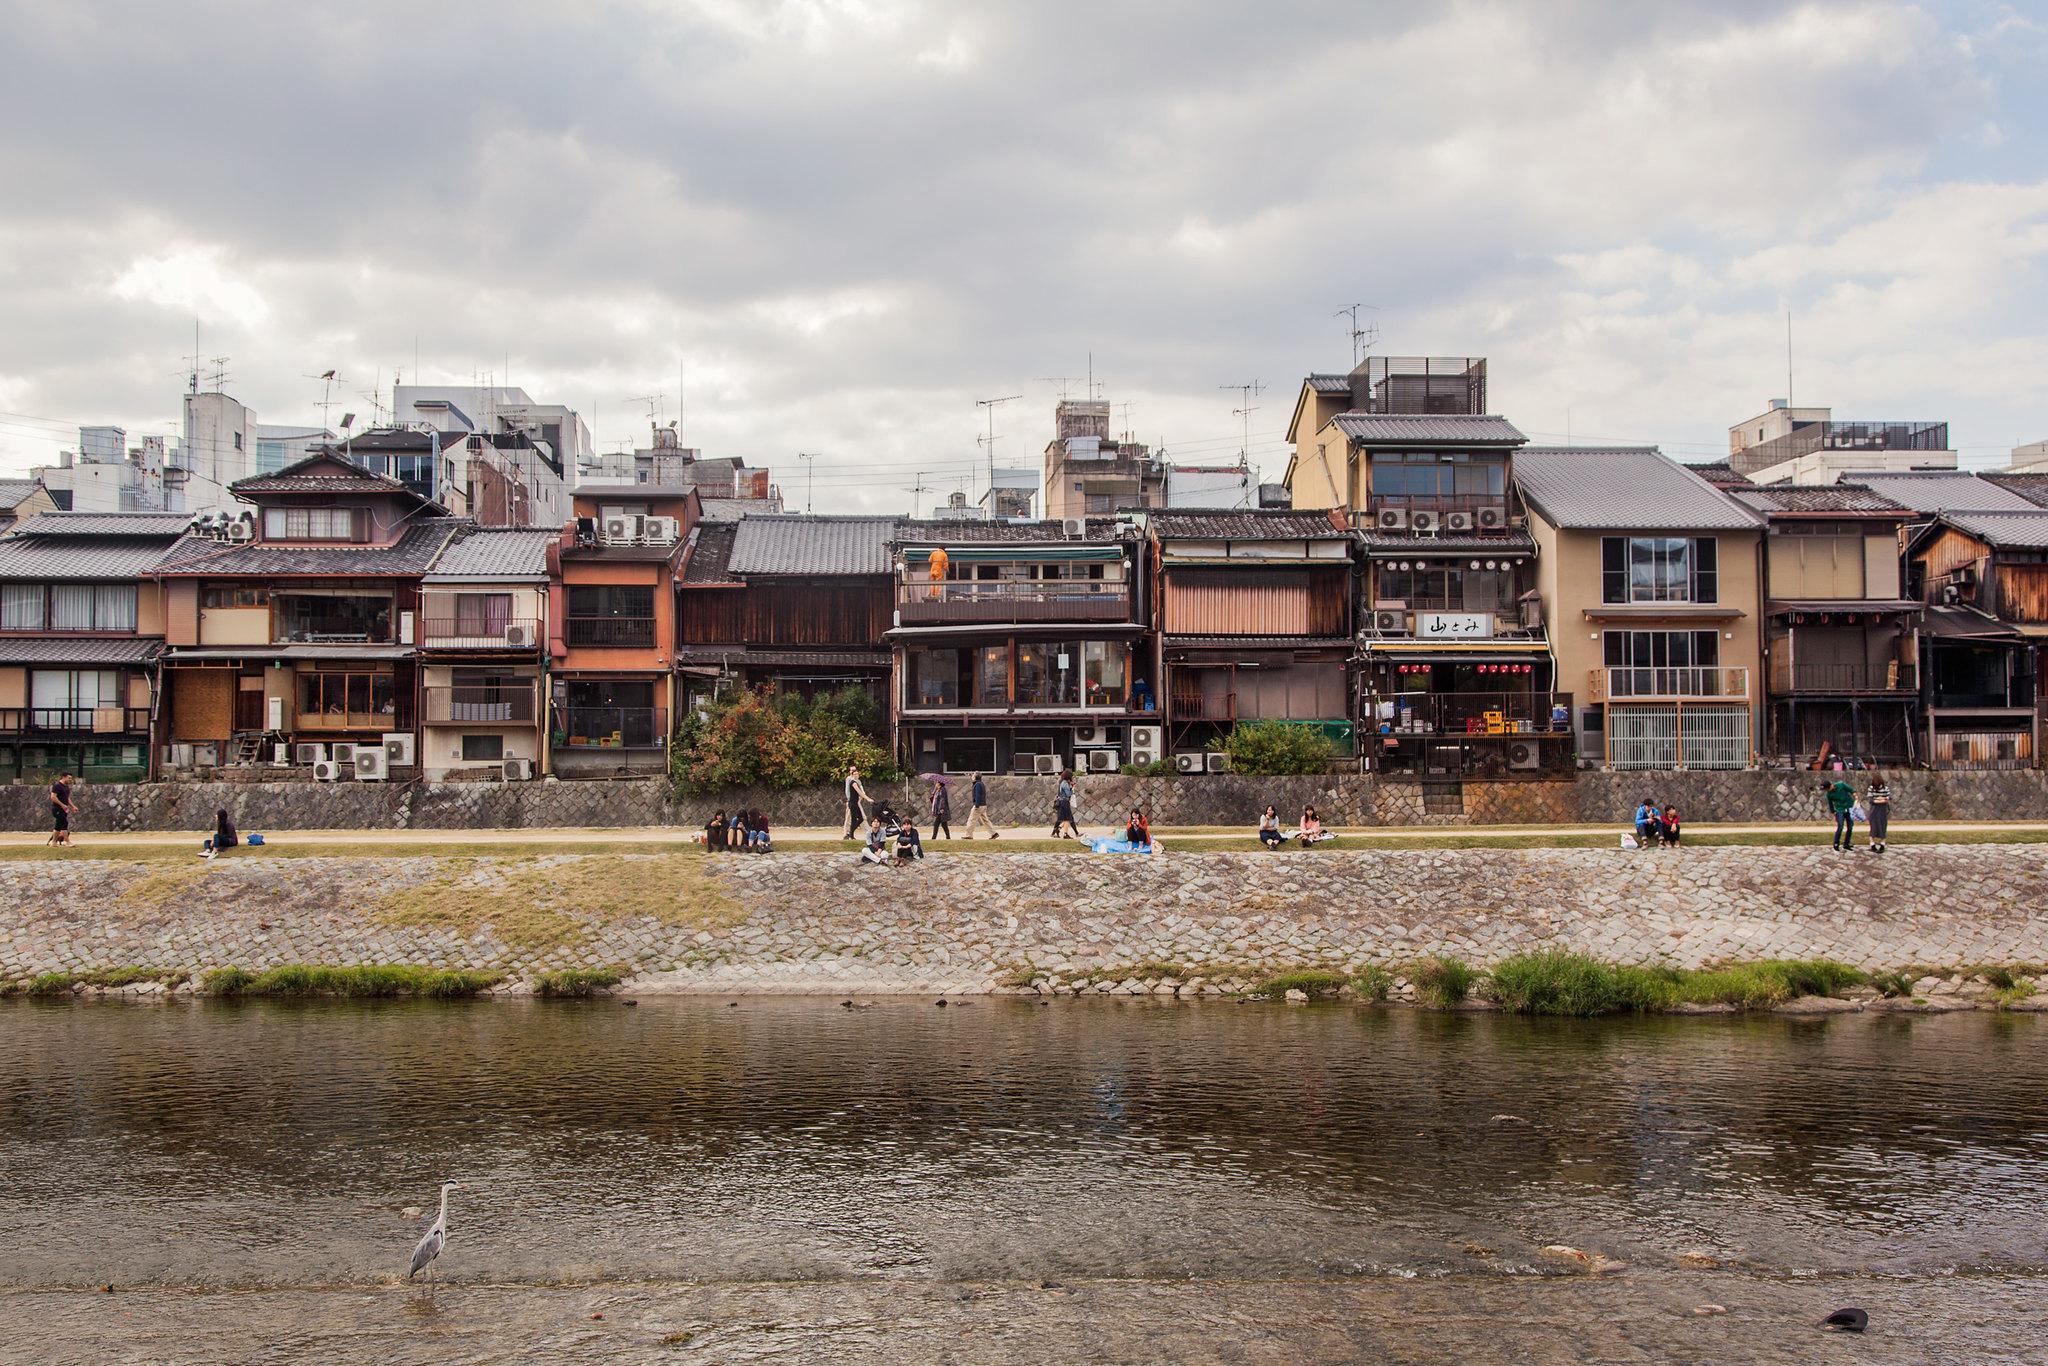 Kamo River 鴨川